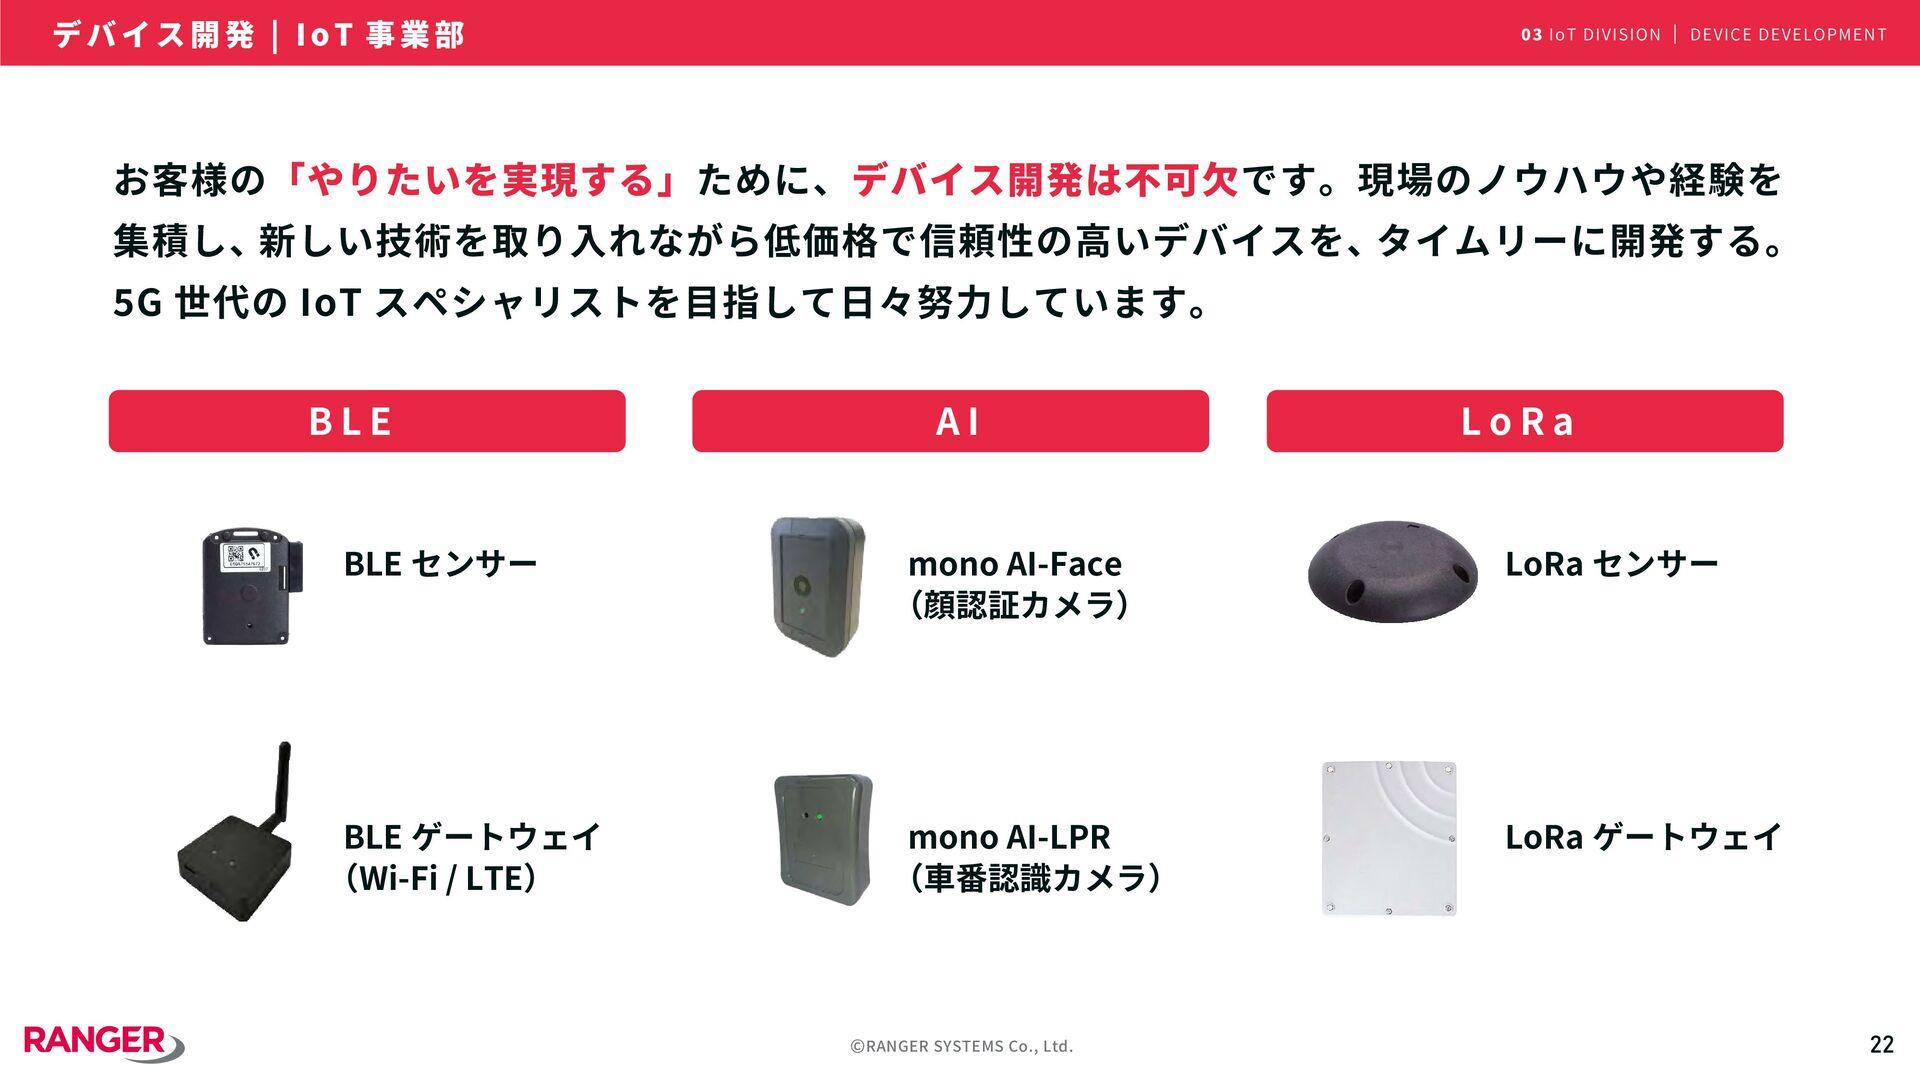 22 ©RANGER SYSTEMS Co., Ltd. IoT サービス デバイス開発 ■ ...